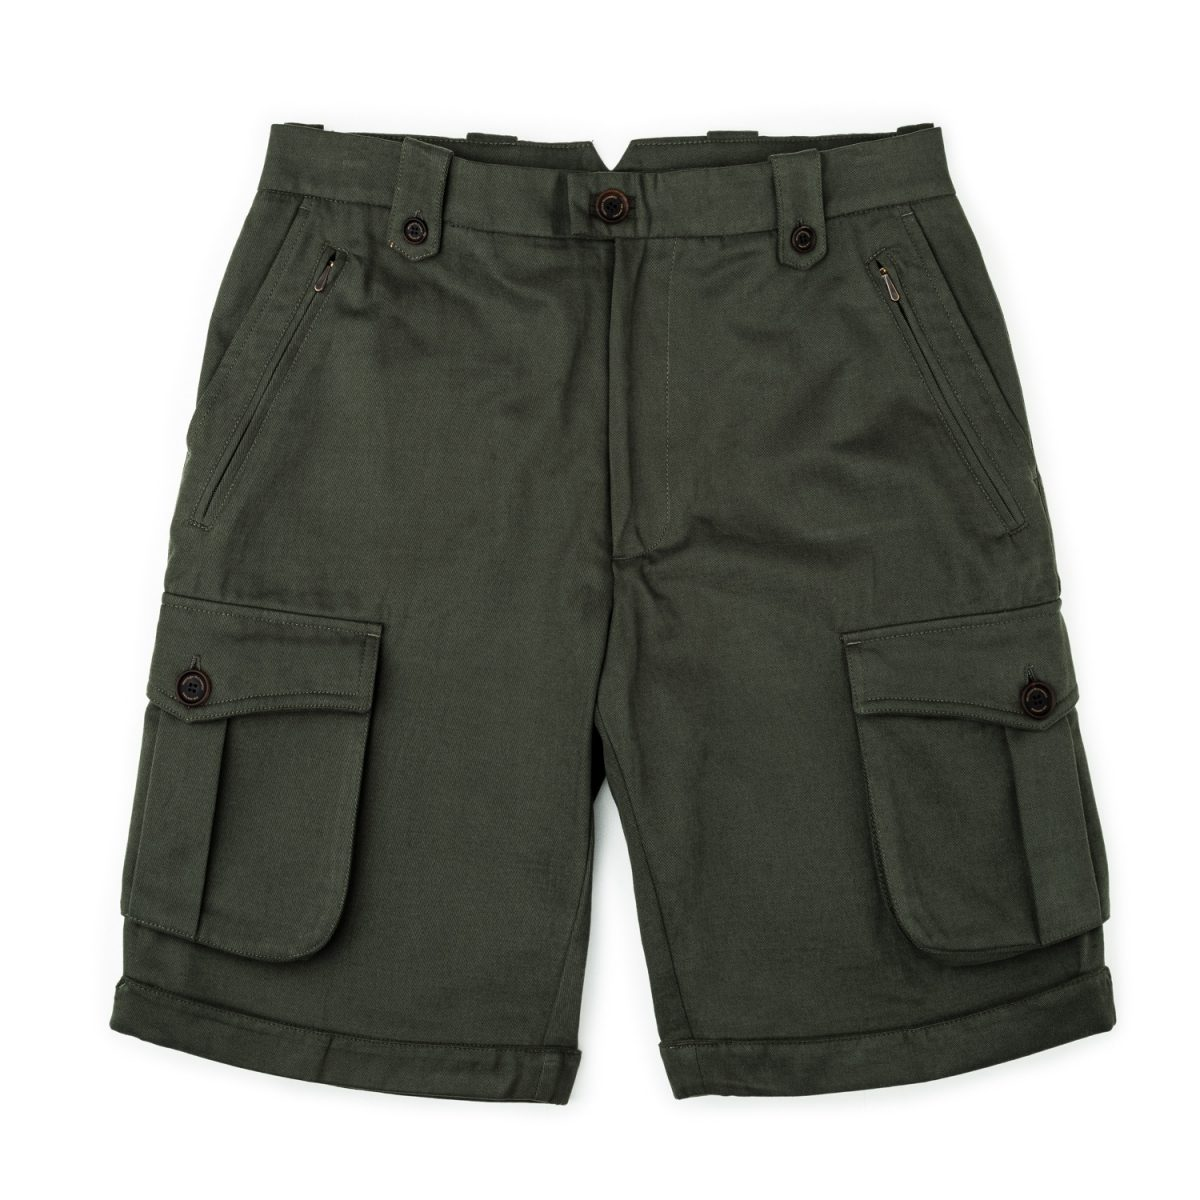 wr_new_safari_shorts_trousers-3359-edit